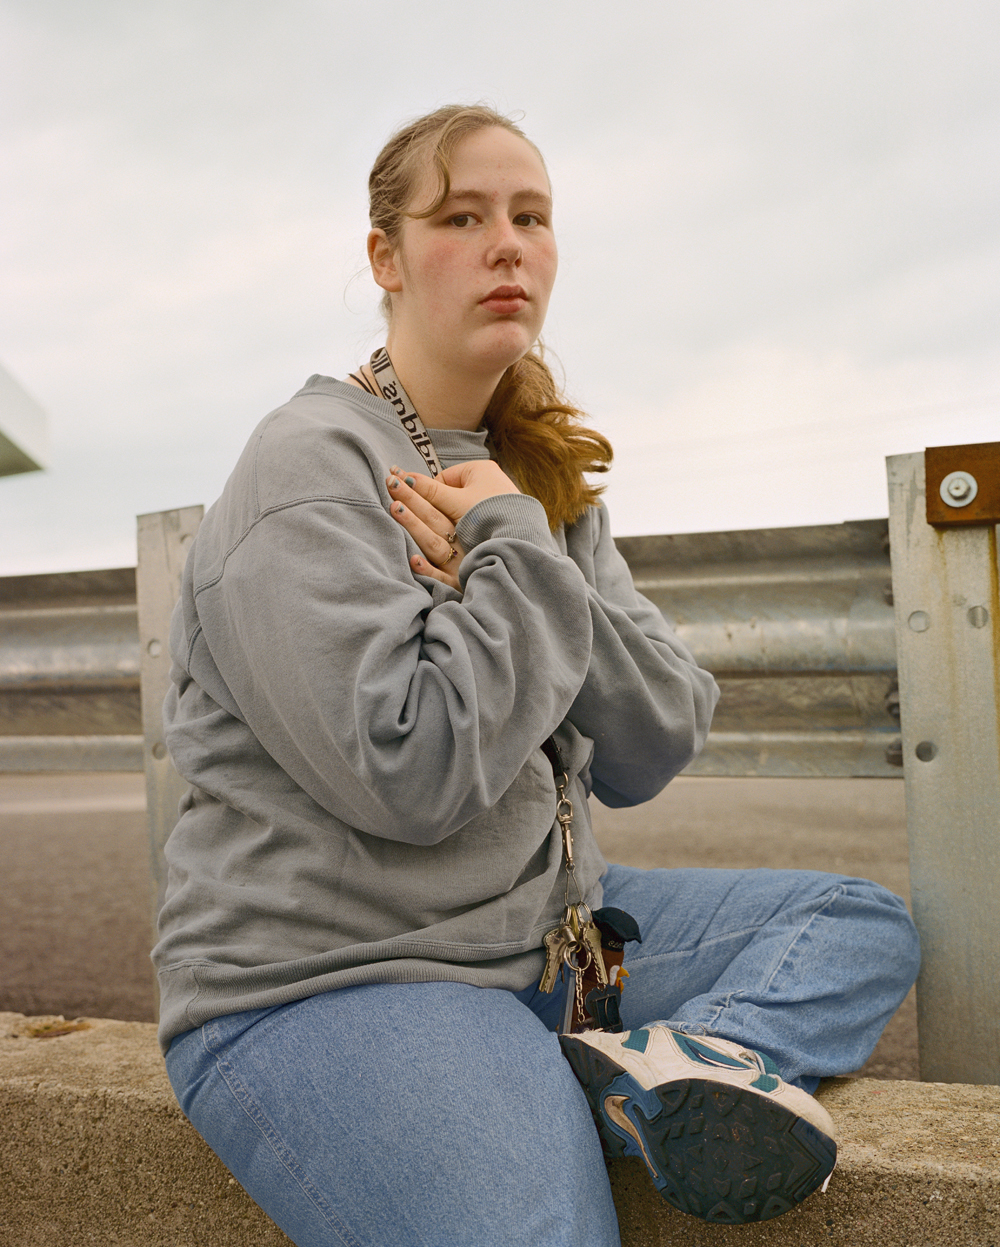 © Jo Ann Walters, Pregnant girl on guardrail, Vermont 2001